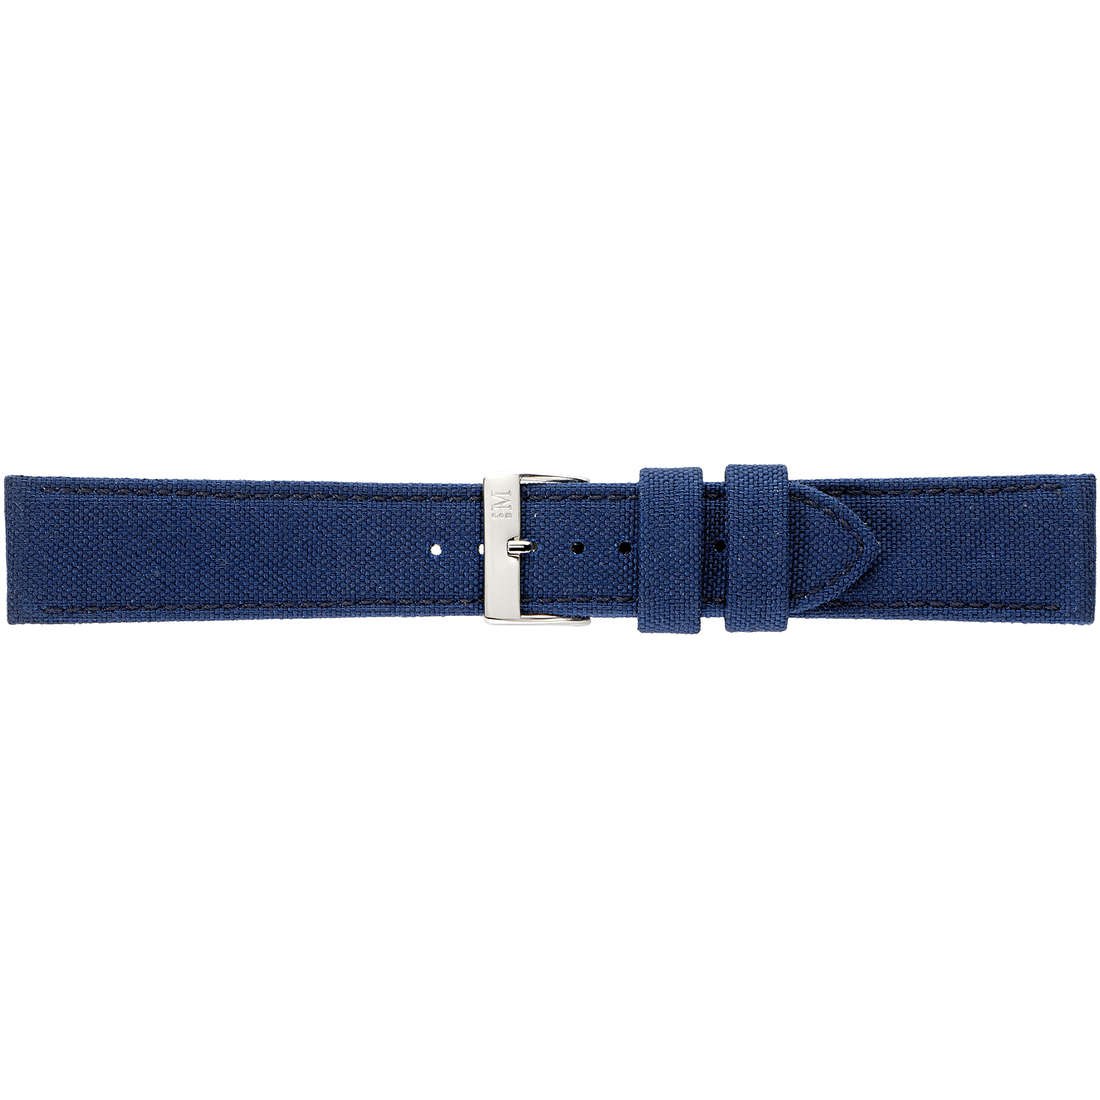 watch watch bands watch straps man Morellato Linea Sport A01U2779110061CR18